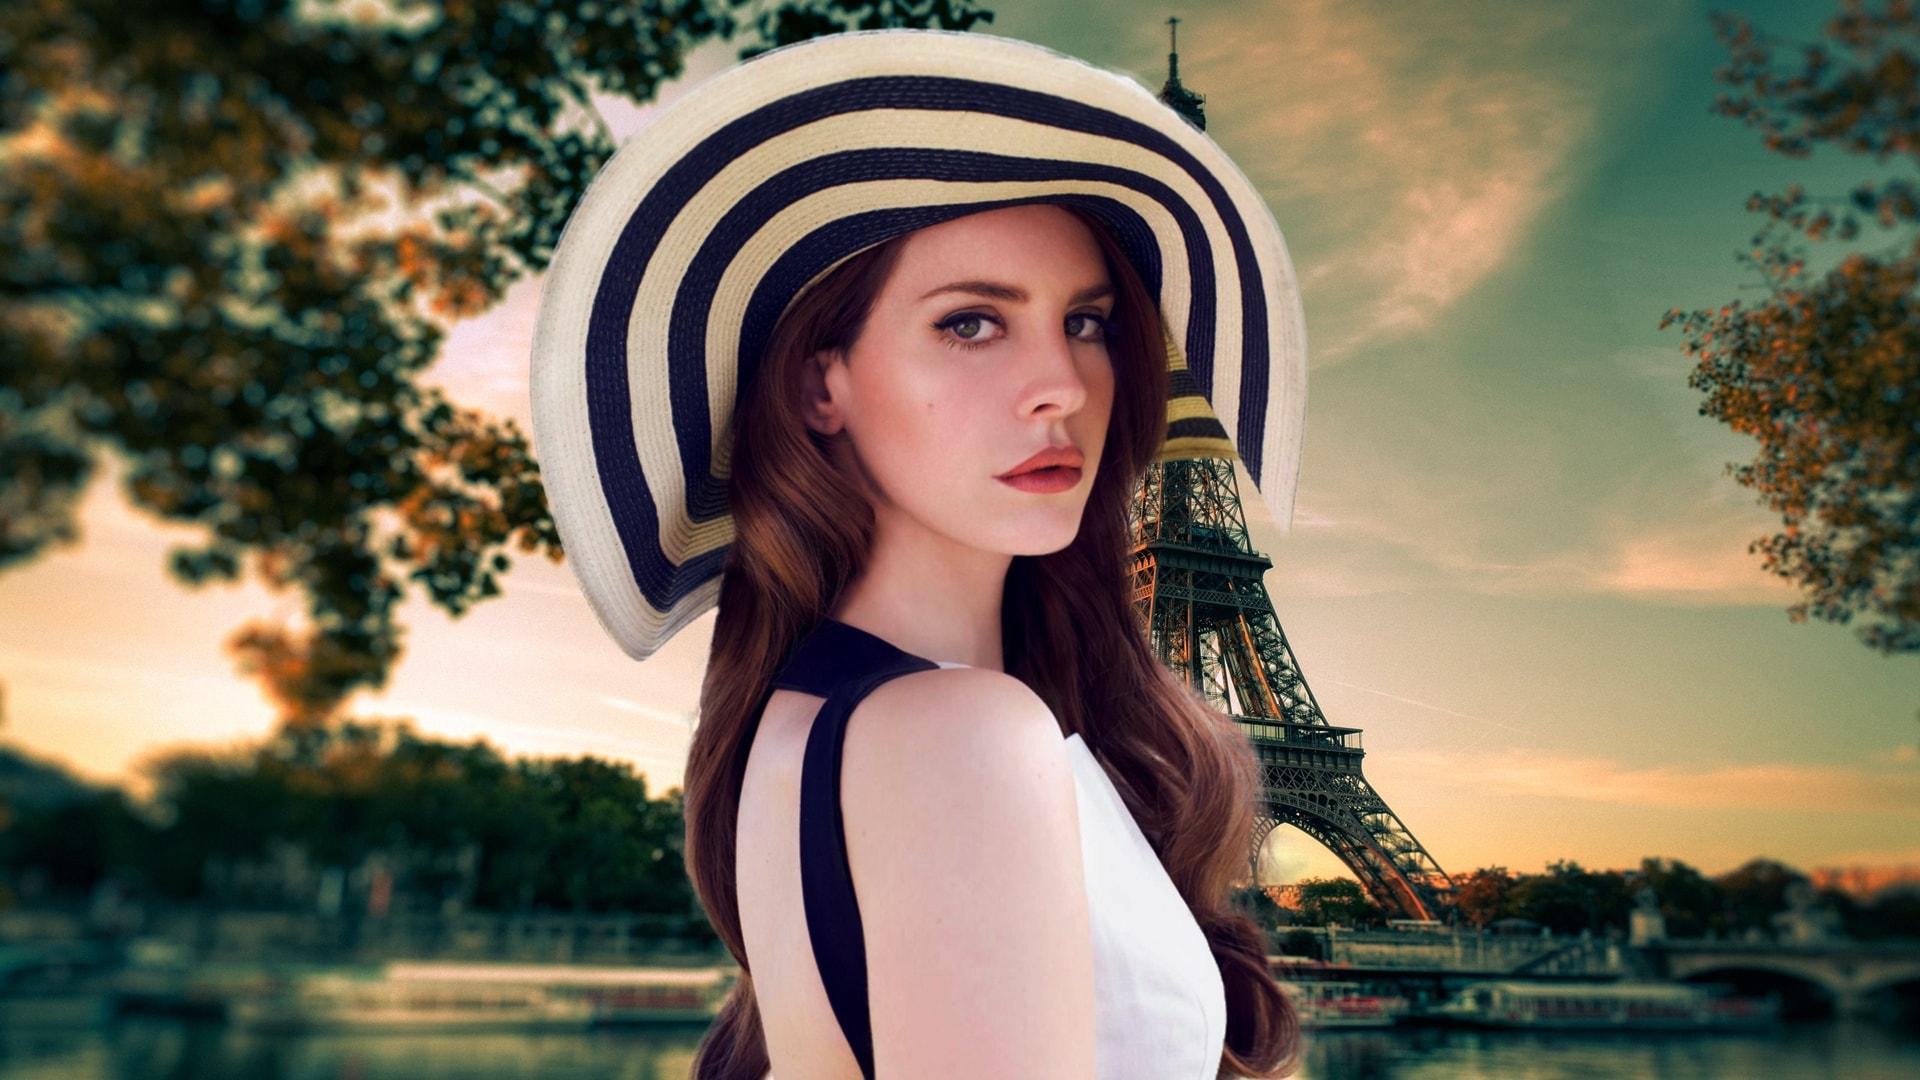 Lana Del Rey Hd Wallpapers 7wallpapers Net